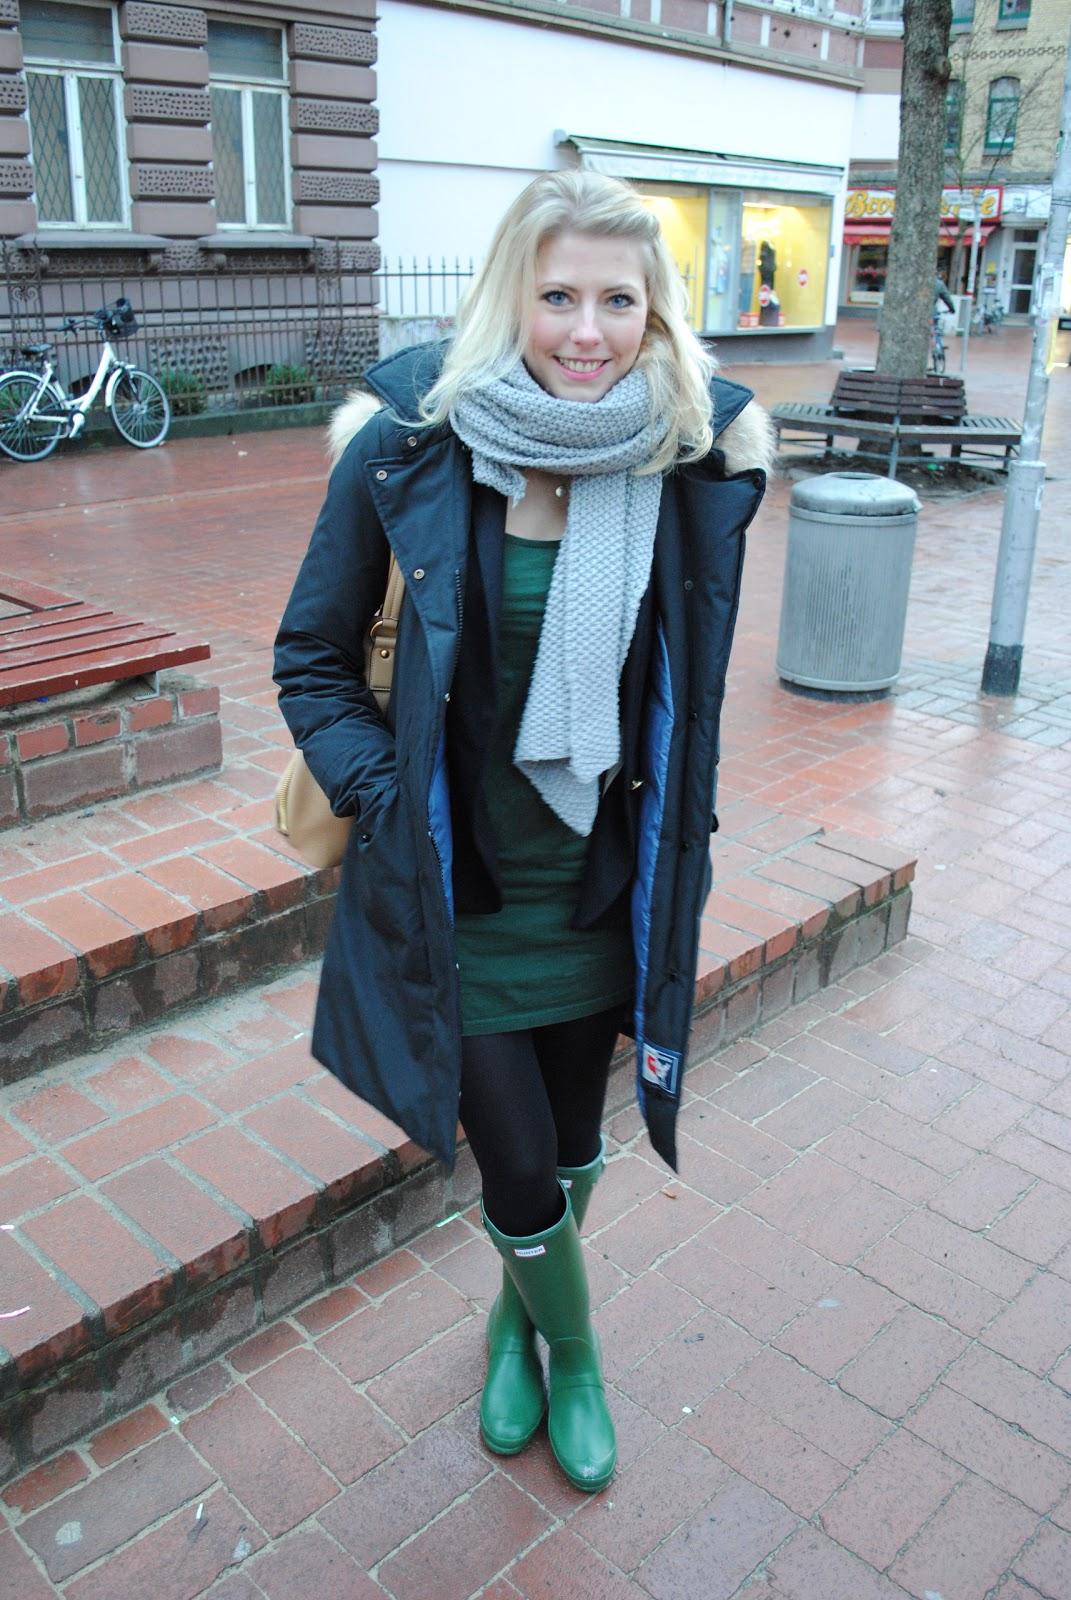 Ootd Hunter Gummistiefel Oh Wunderbar Blog Family Fashion Lifestyle Travel